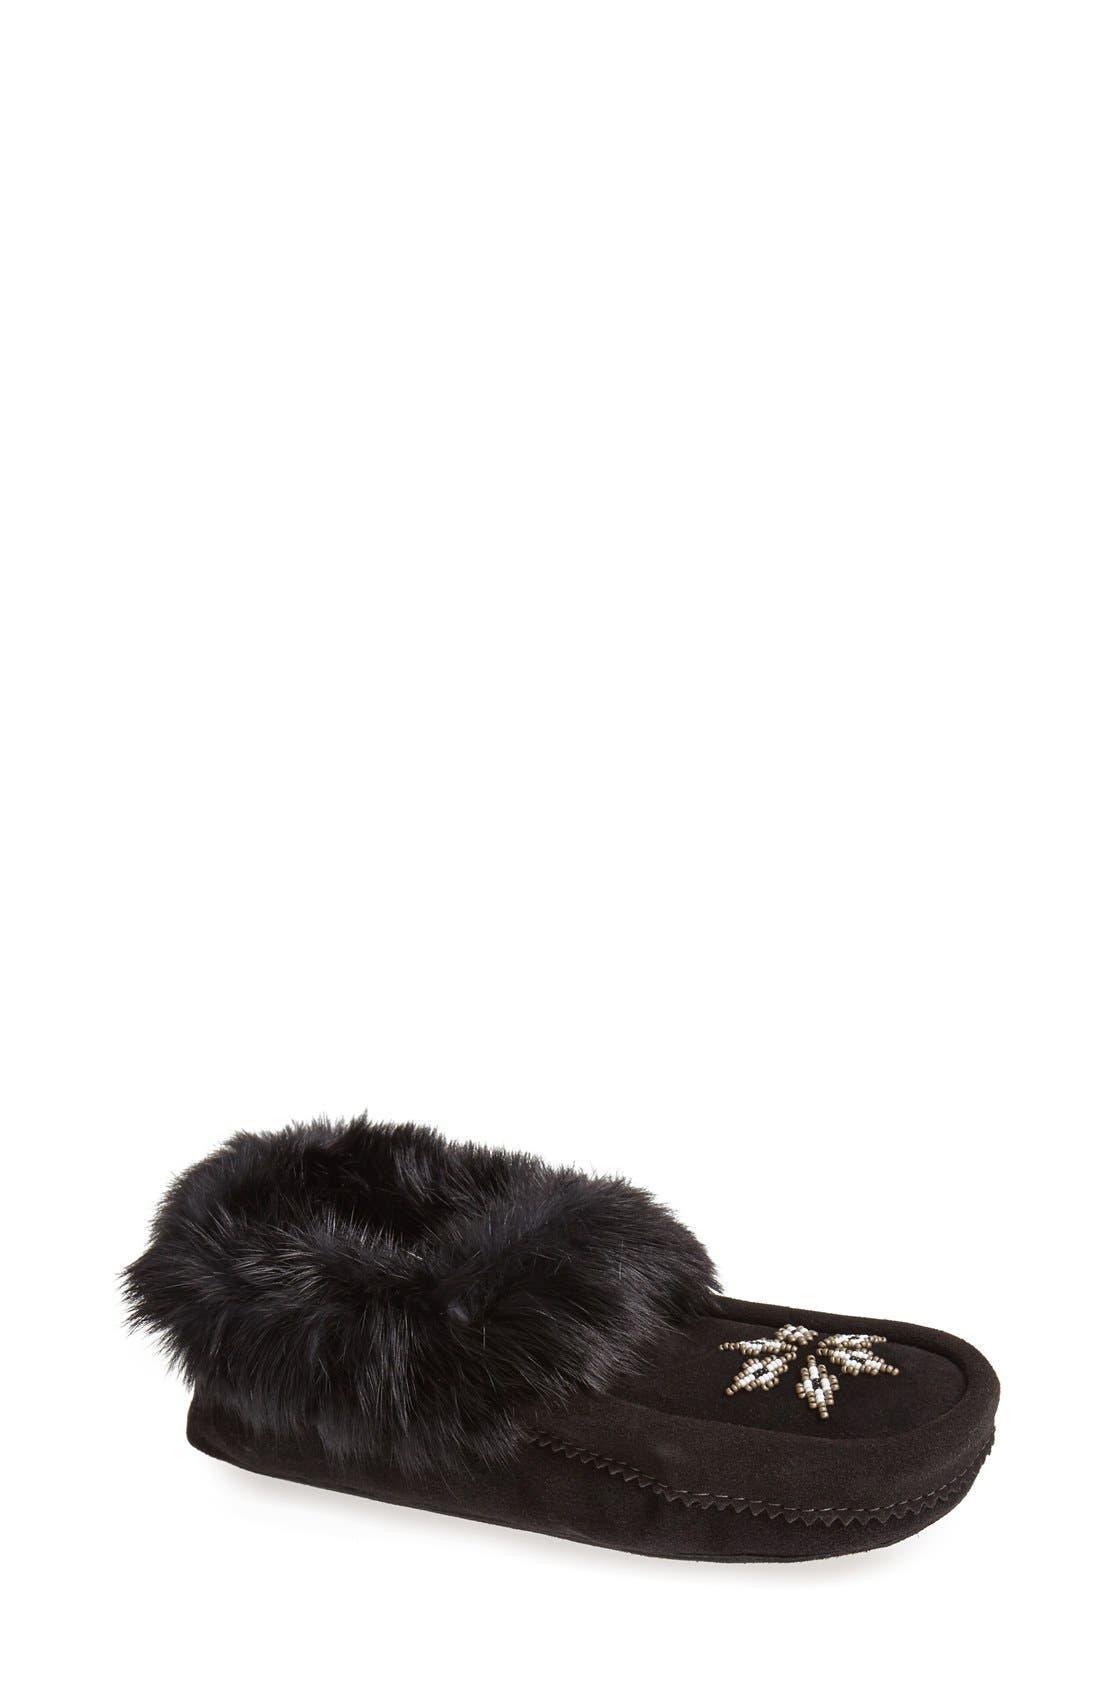 MANITOBAH MUKLUKS 'Kanada' Genuine Rabbit Fur & Suede